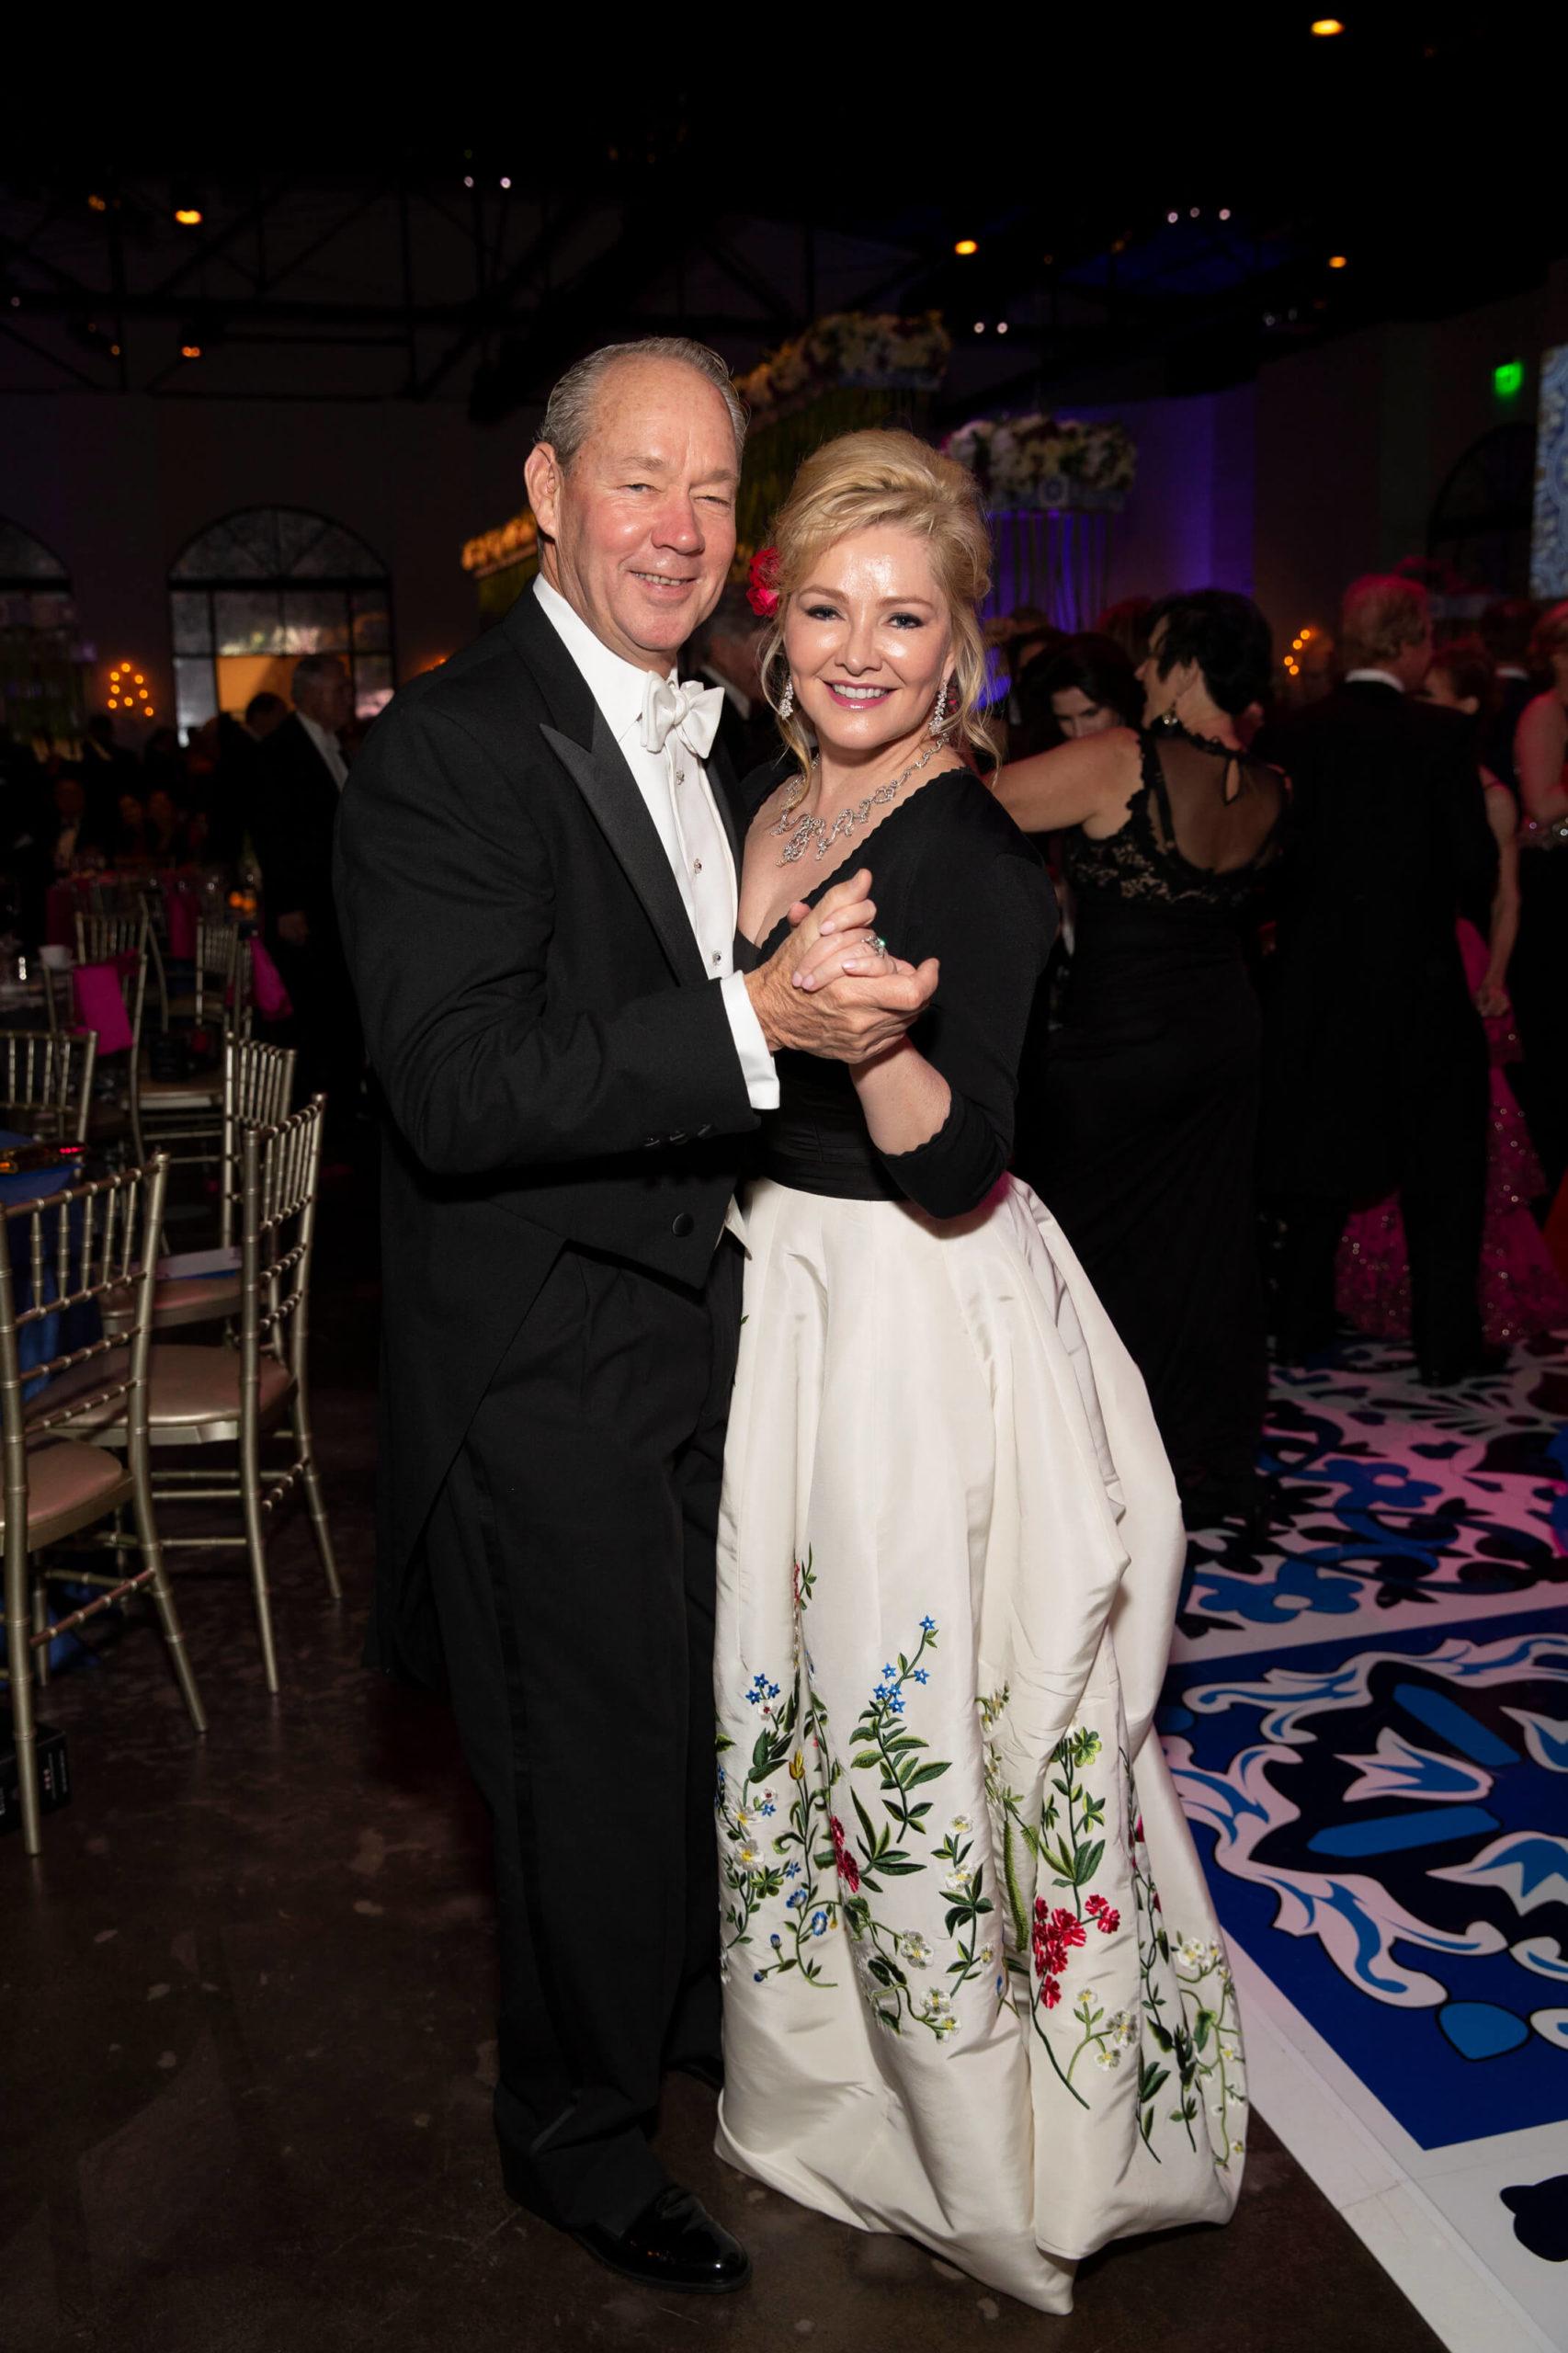 Jim and Whitney Crane